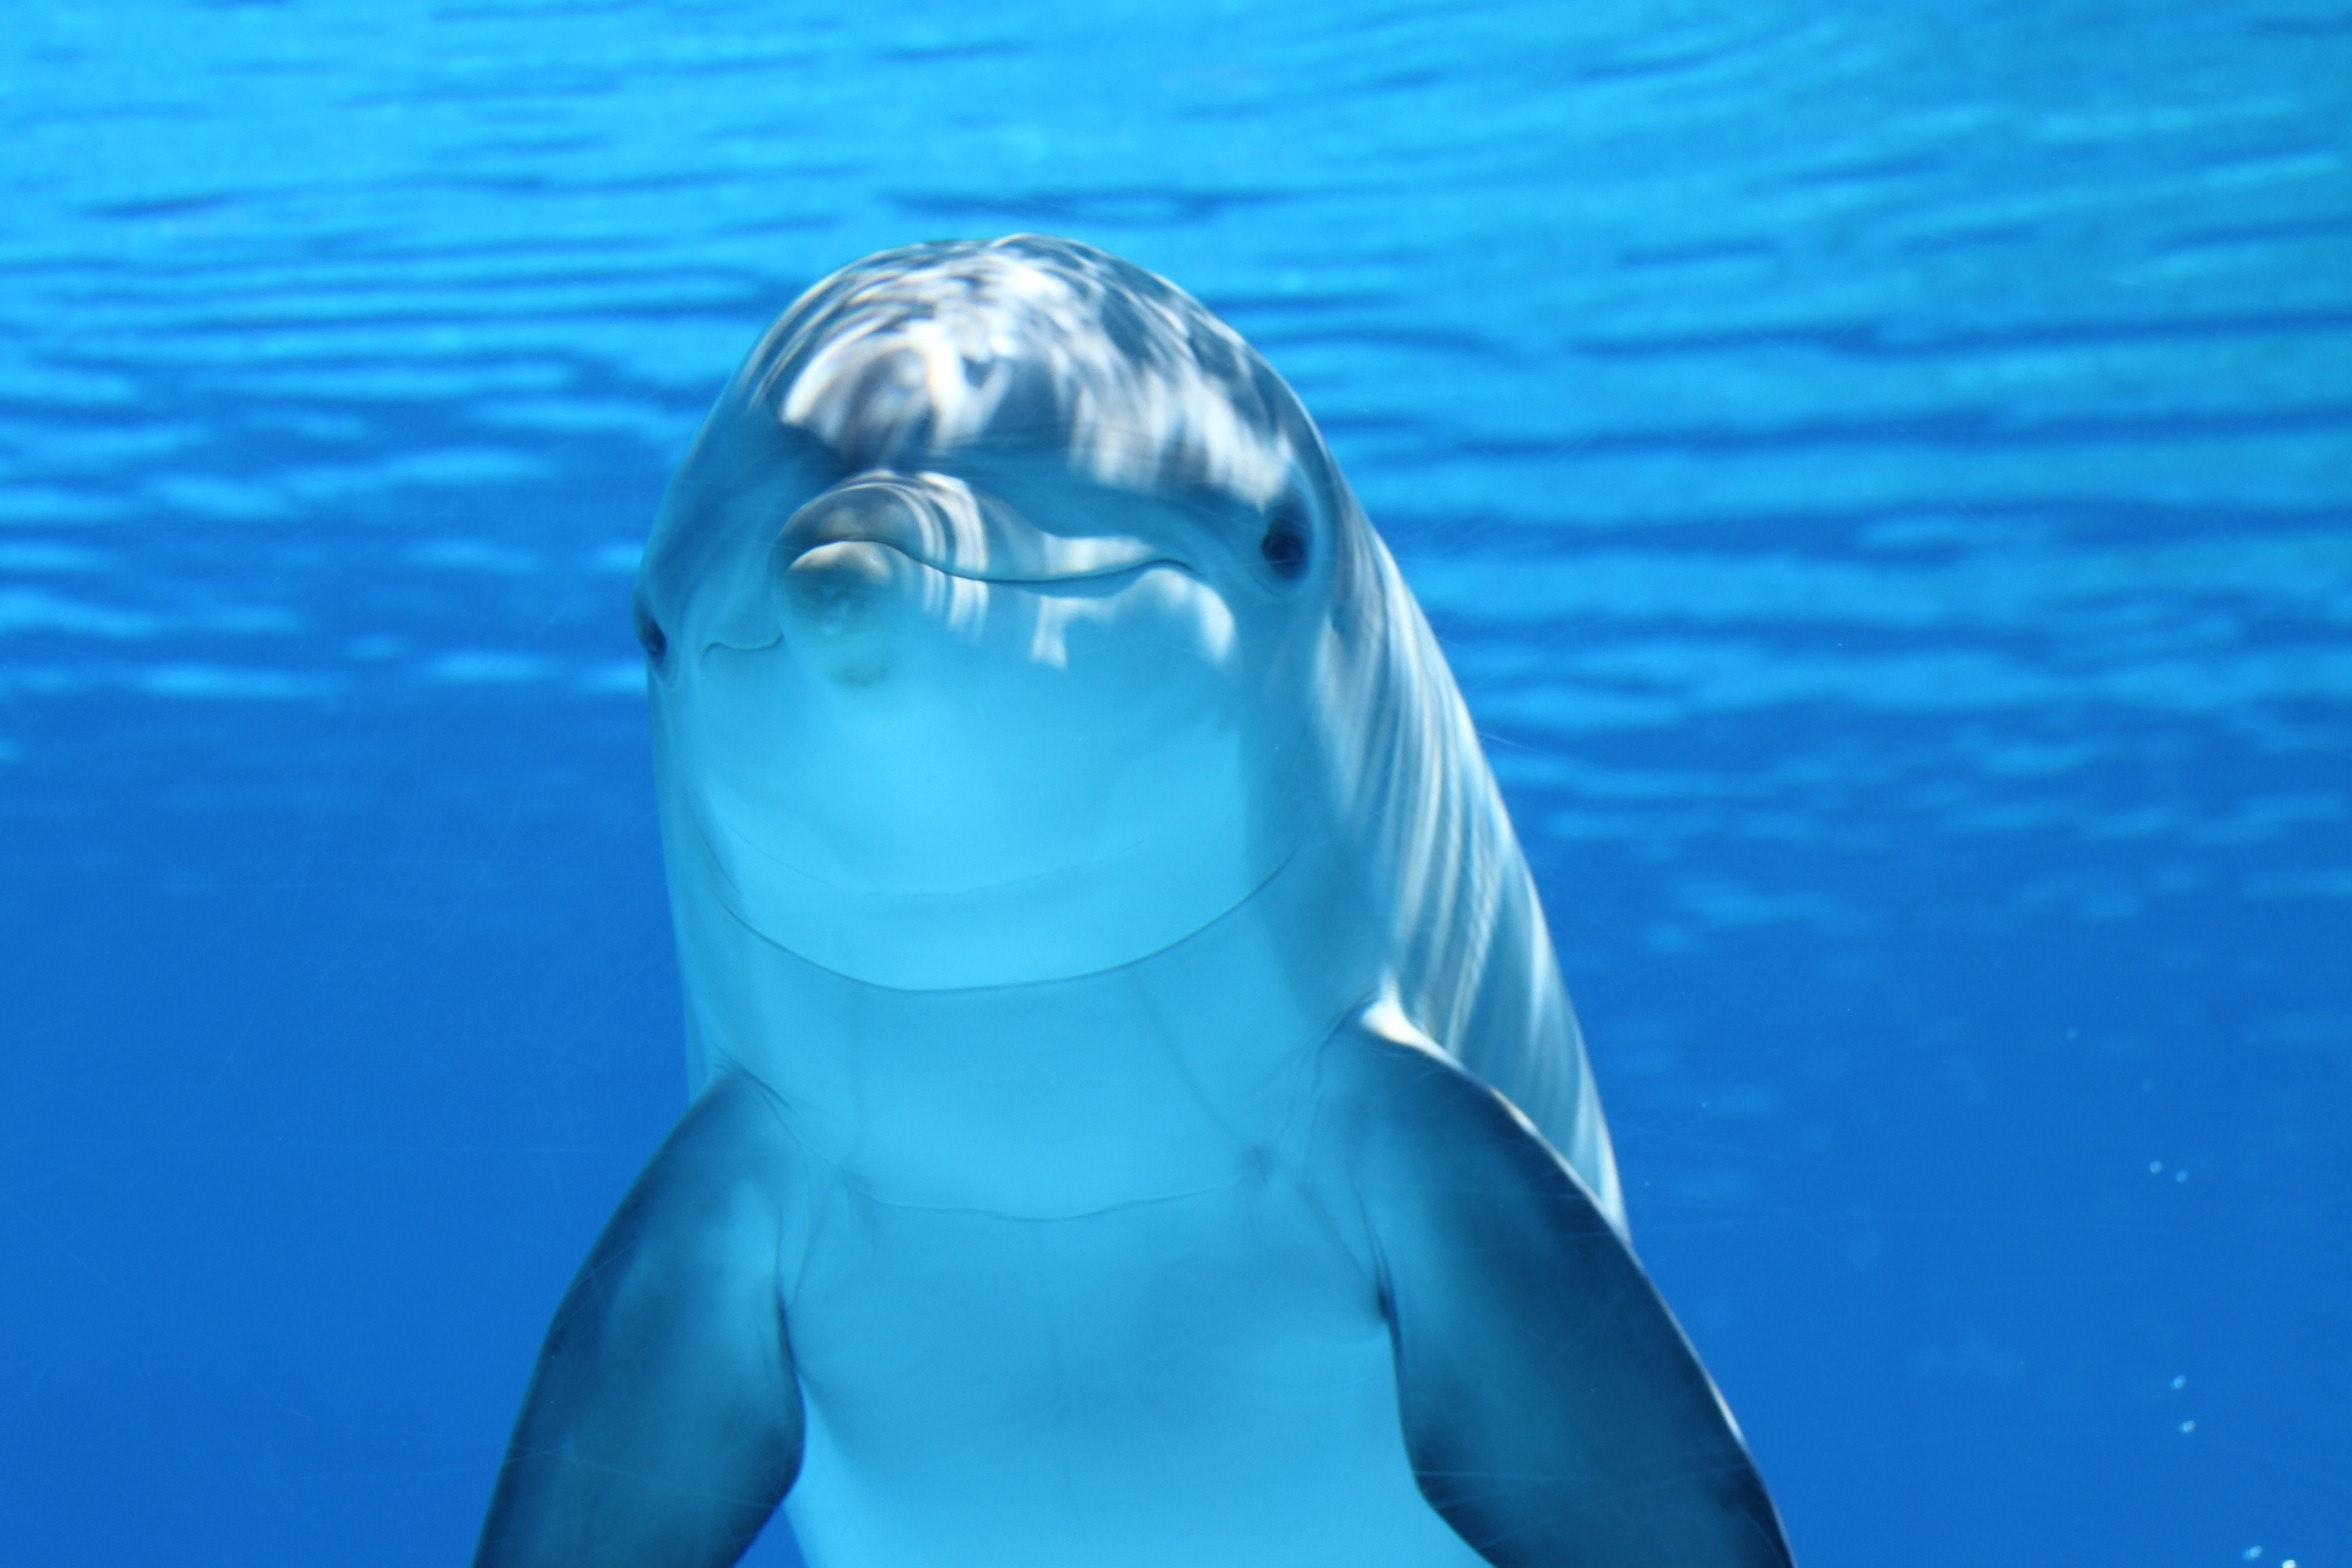 animal-close-up-cute-64219.jpg